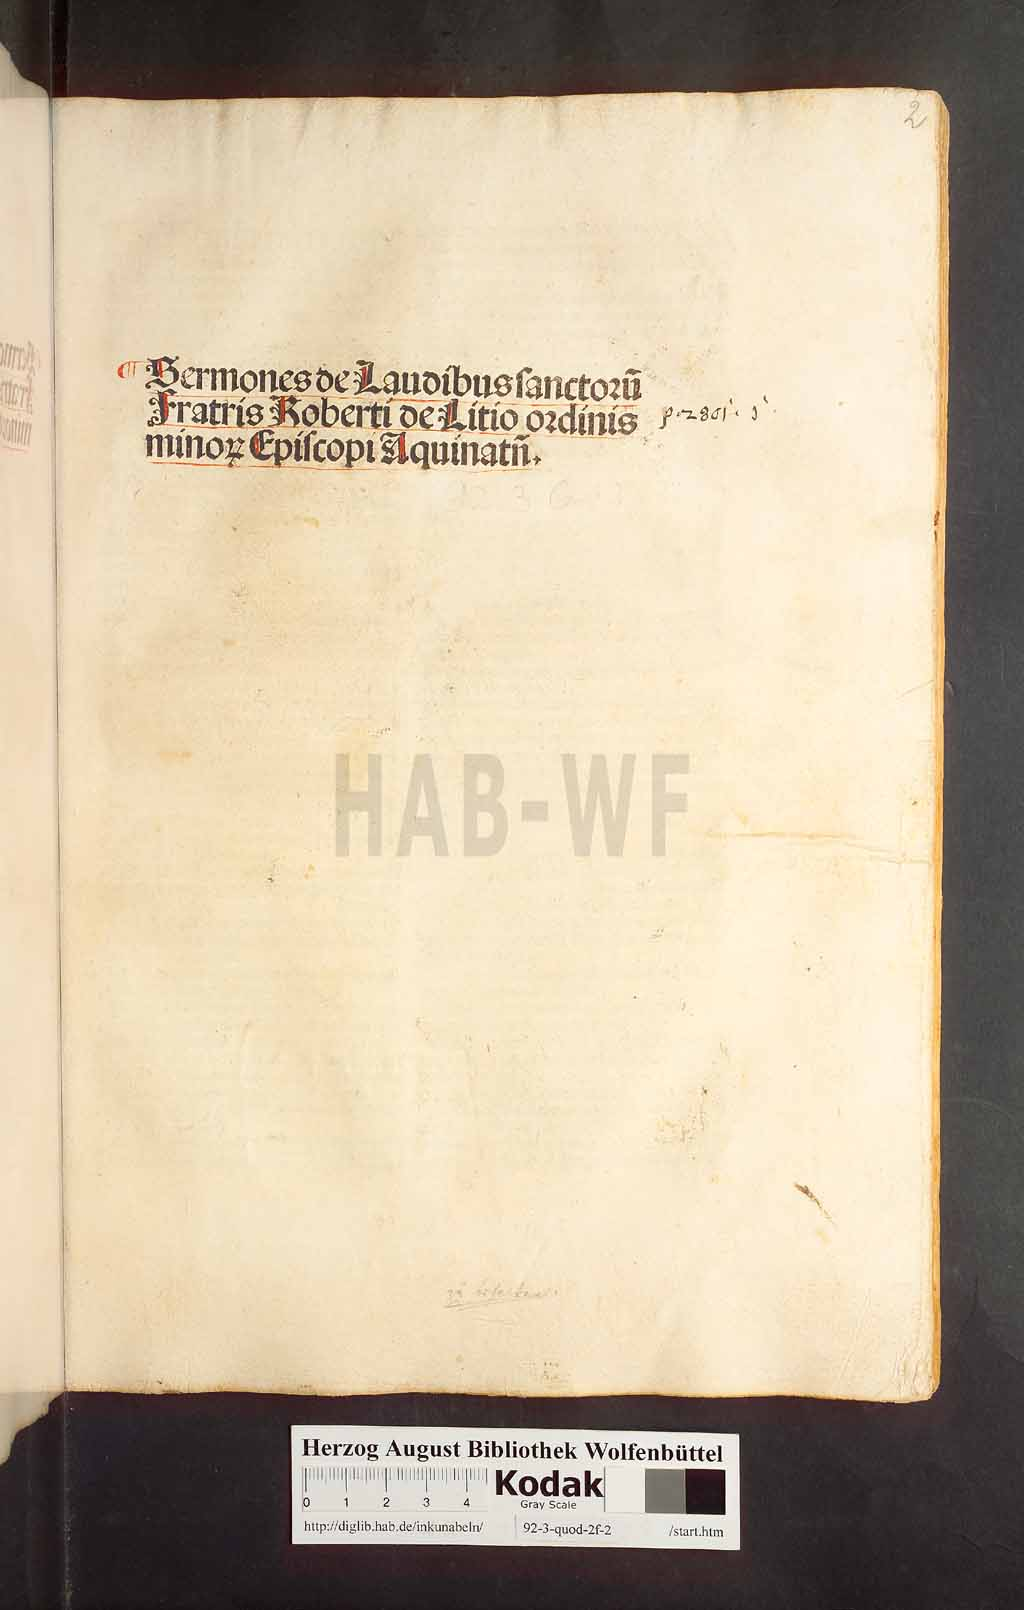 http://diglib.hab.de/inkunabeln/92-3-quod-2f-2/00001.jpg